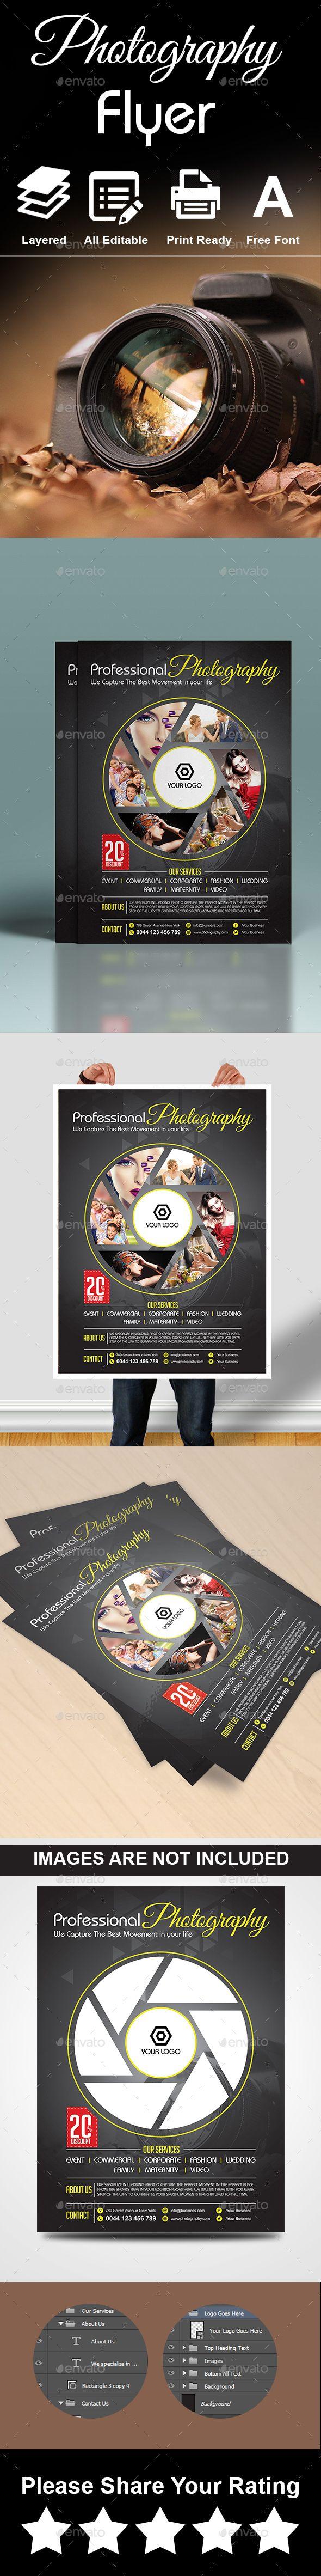 Mejores 171 imágenes de Flyer Templates en Pinterest | Plantilla de ...